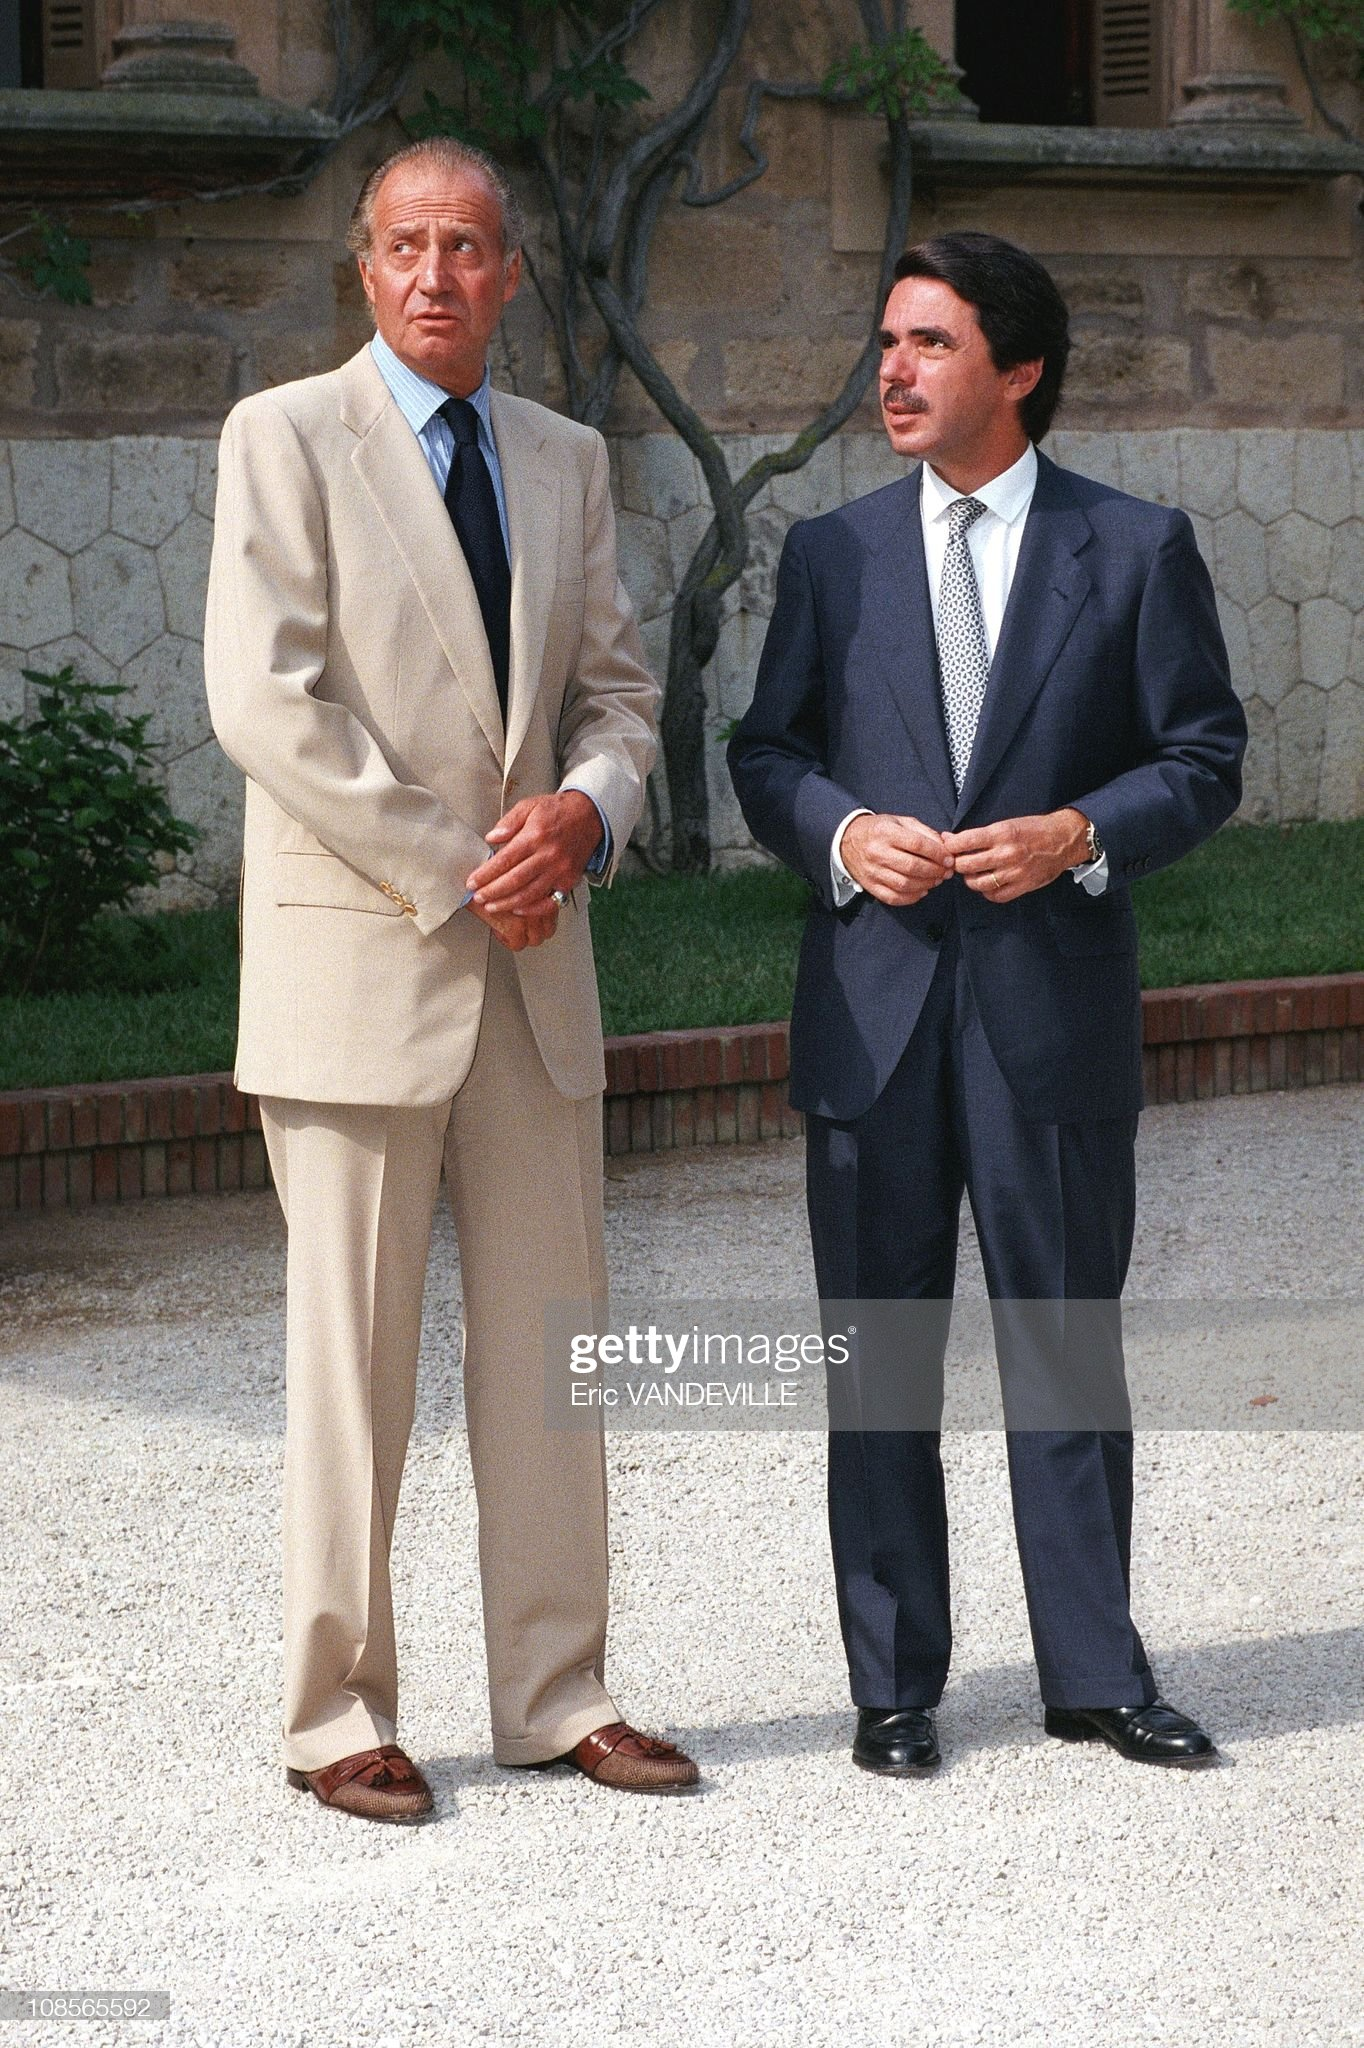 ¿Cuánto mide el Rey Juan Carlos I? - Altura - Real height Juan-carlos-of-spain-receives-aznar-jose-maria-in-madrid-spain-on-picture-id108565592?s=2048x2048